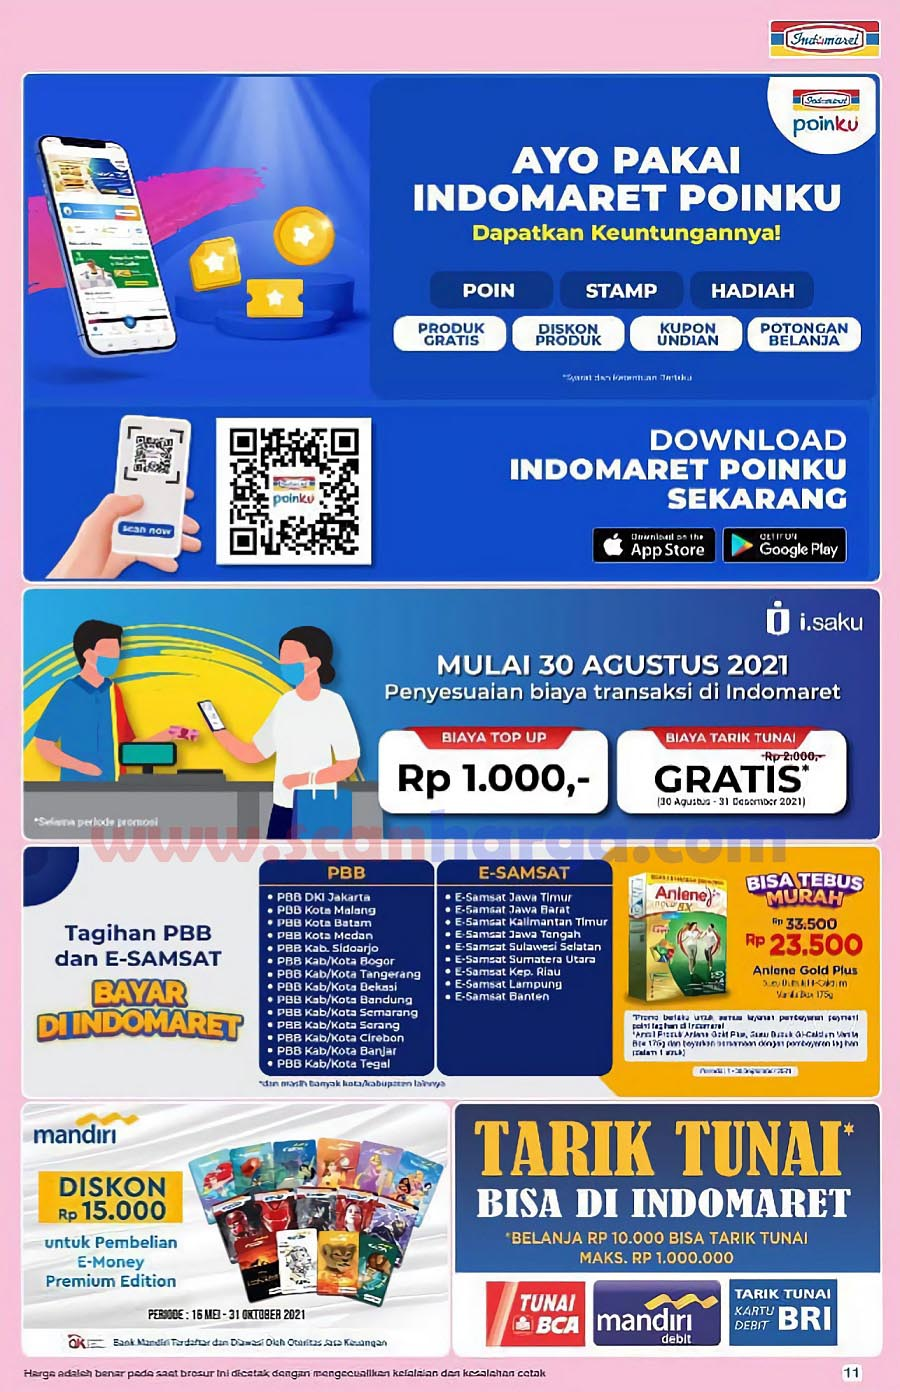 Katalog Indomaret Promo Terbaru 15 - 21 September 2021 11